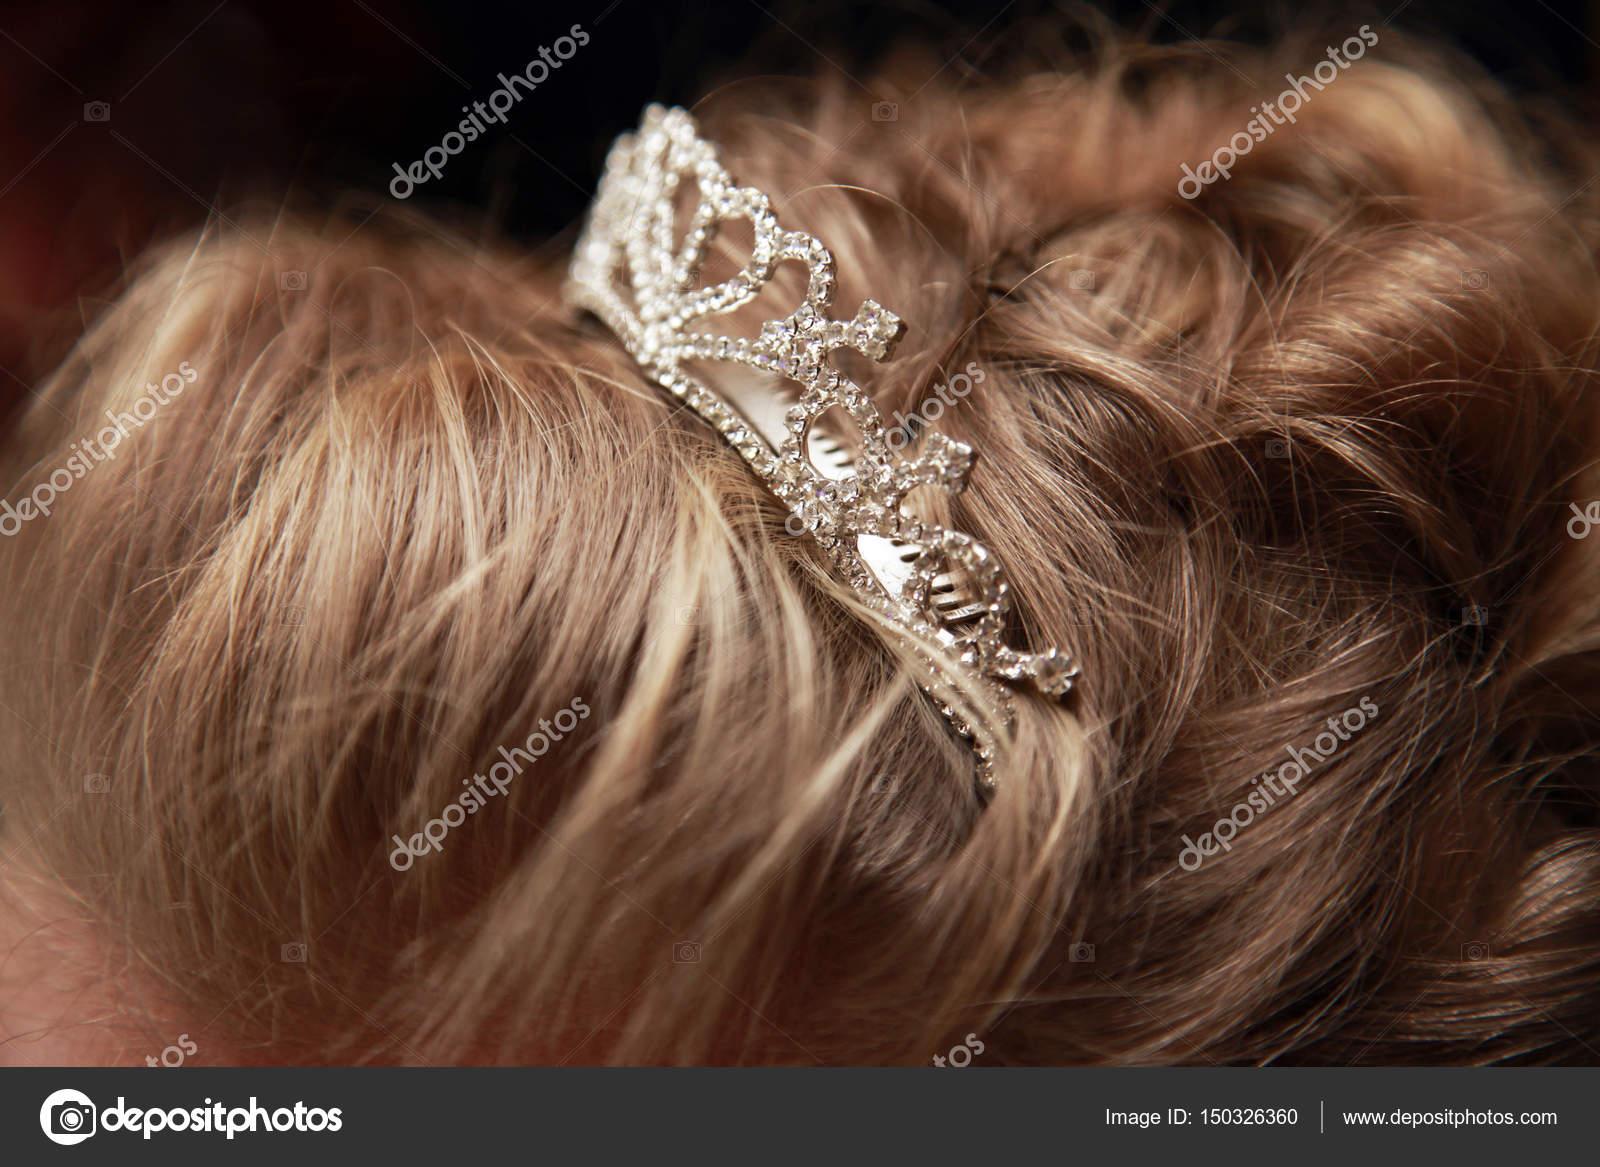 c278ef7217 Γάμου τιάρα για νύφη μαλλιά γκρο πλαν — Φωτογραφία Αρχείου © friday ...